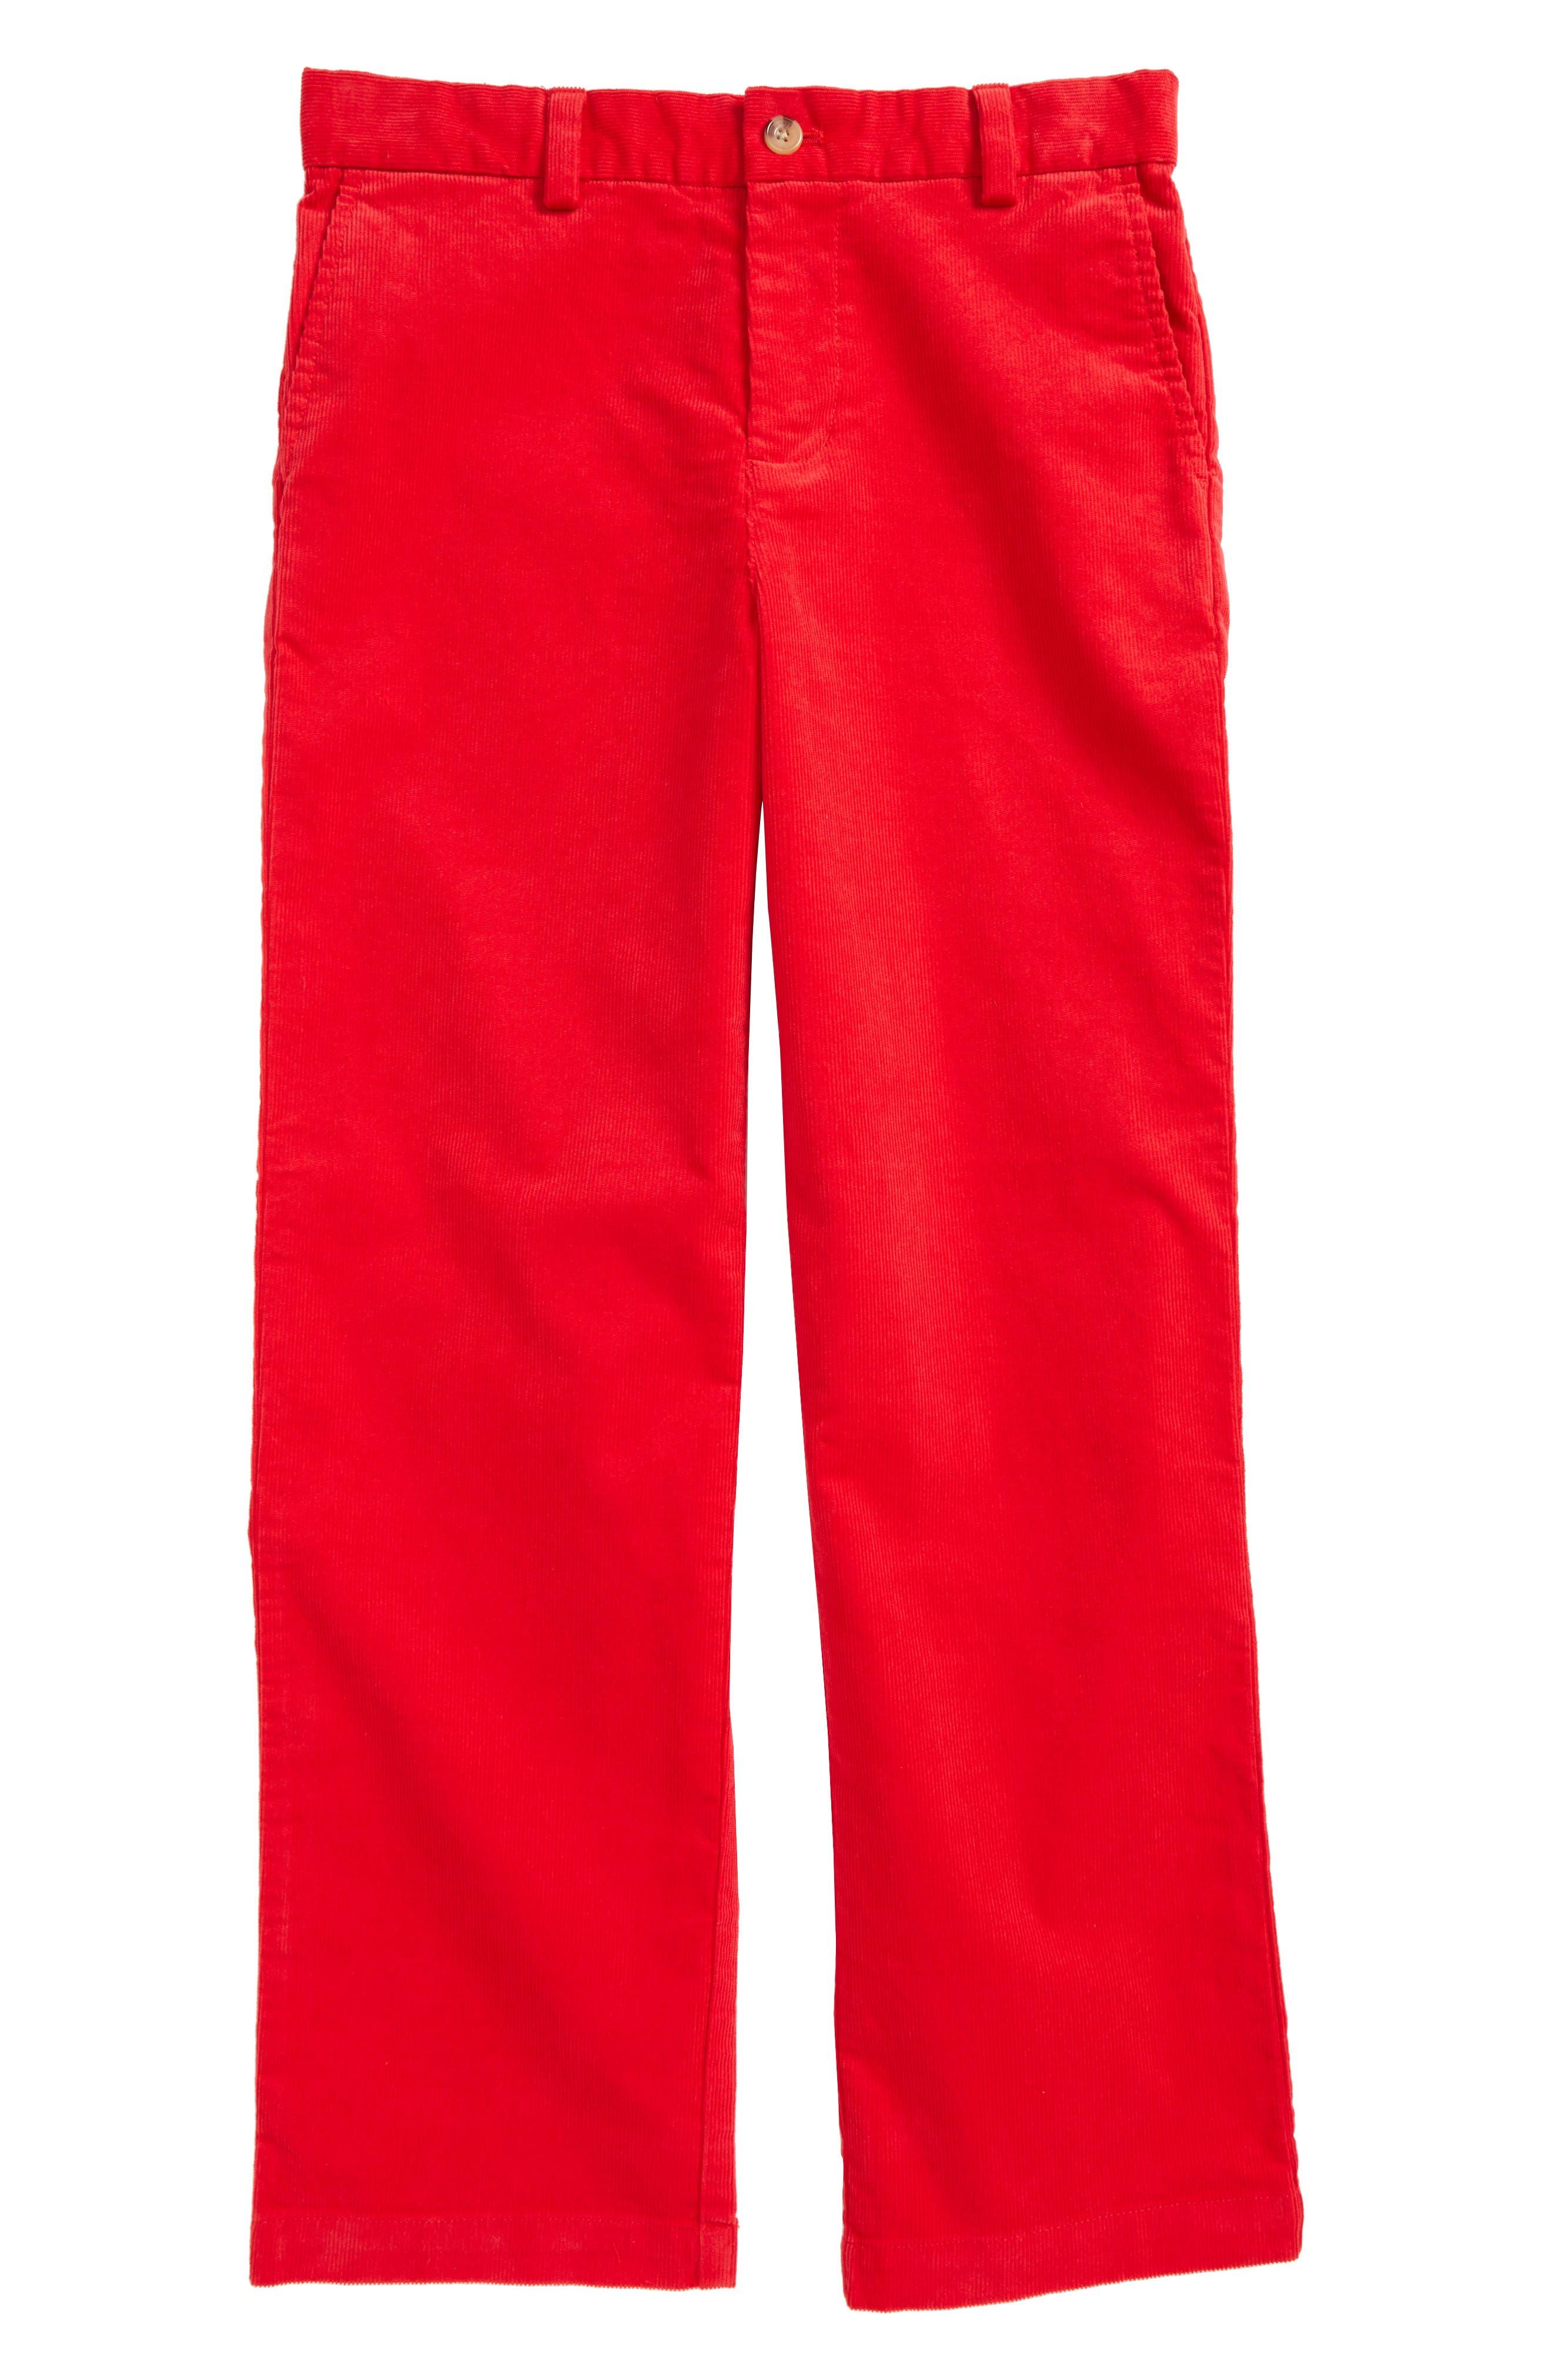 Breaker Corduroy Pants,                             Main thumbnail 3, color,